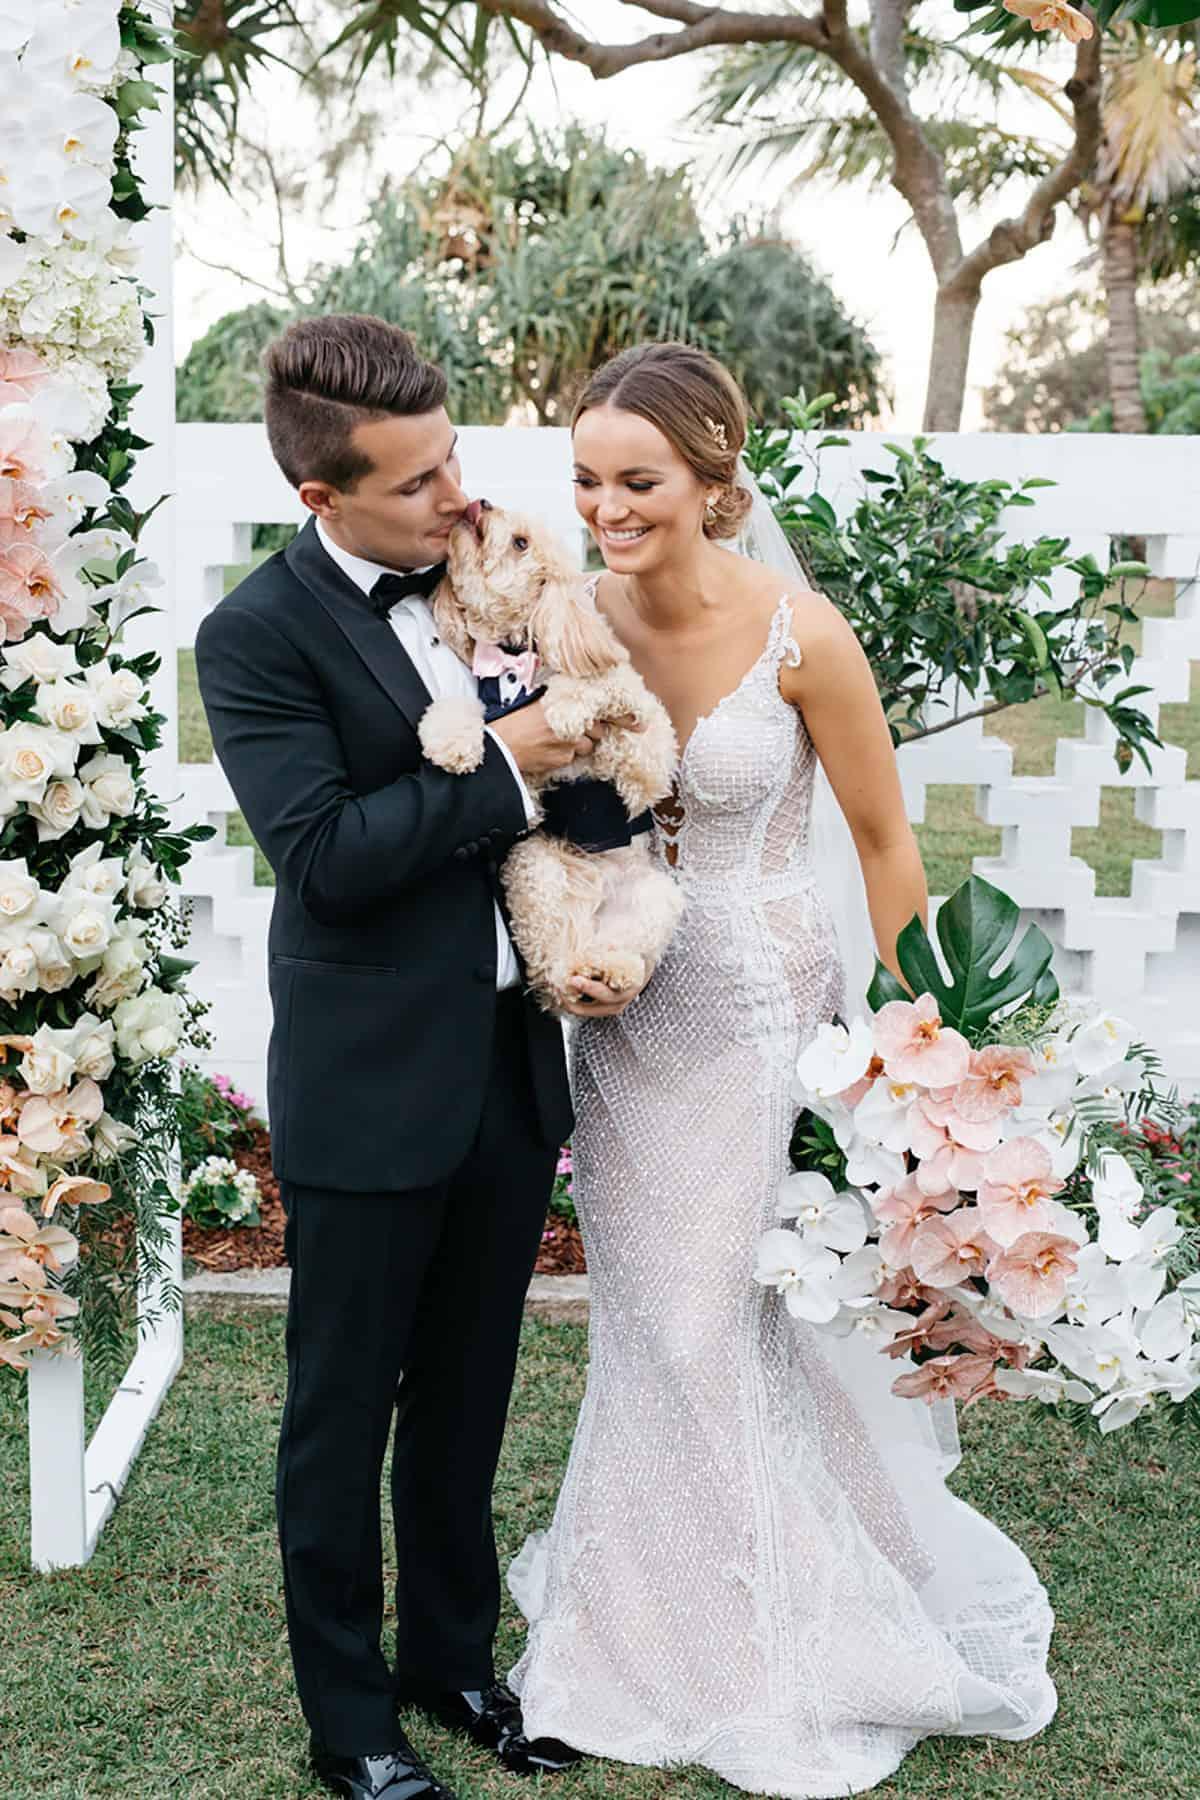 Hayley and Sarm wedding at Halcyon House